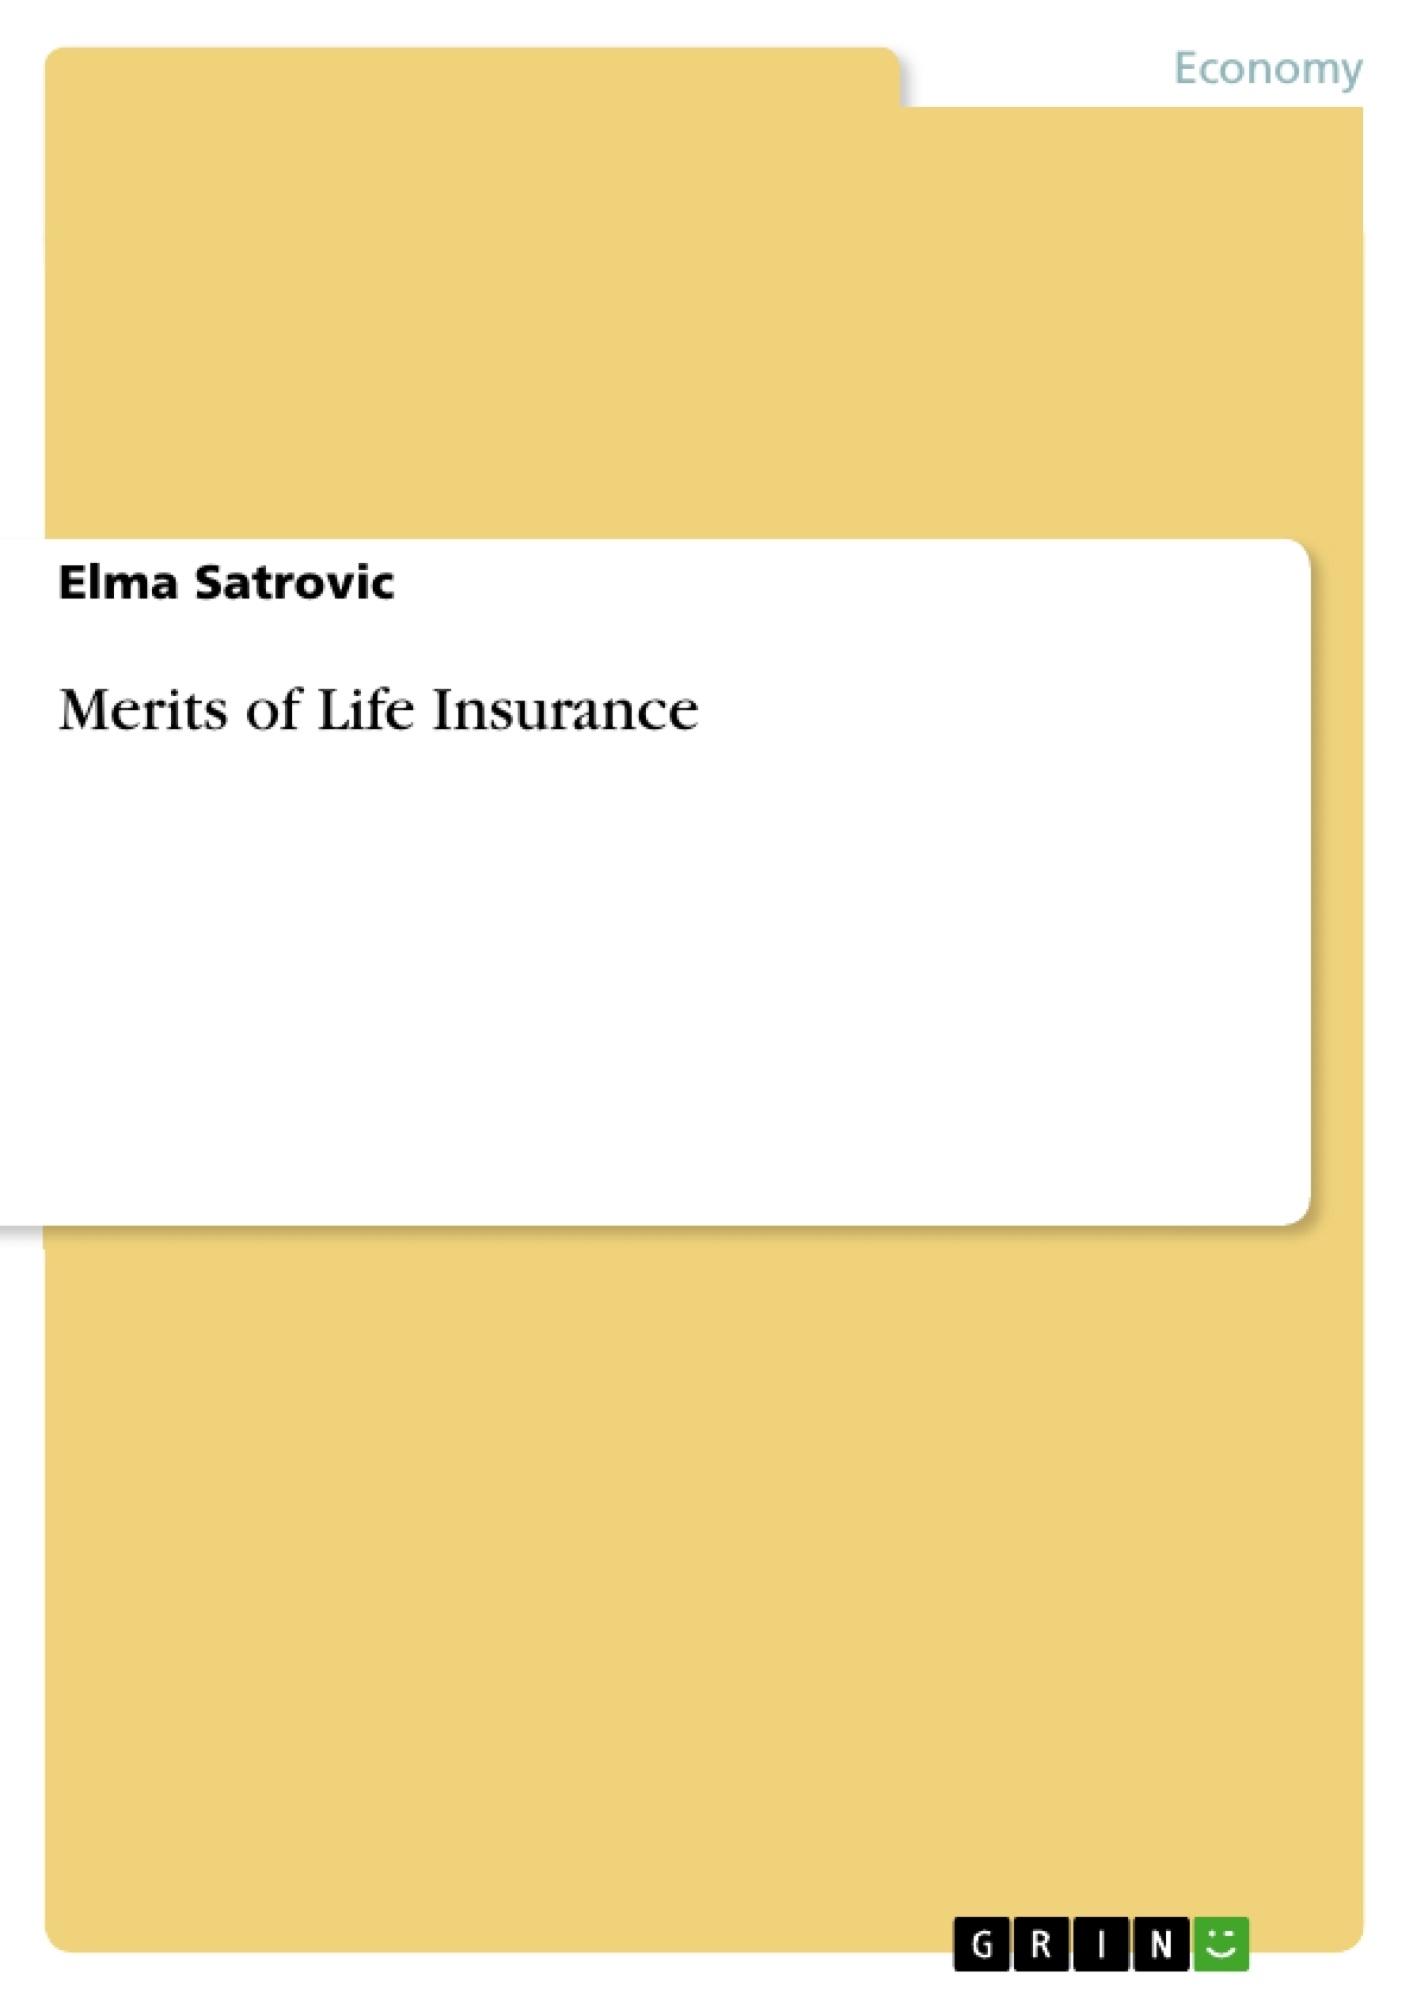 Title: Merits of Life Insurance